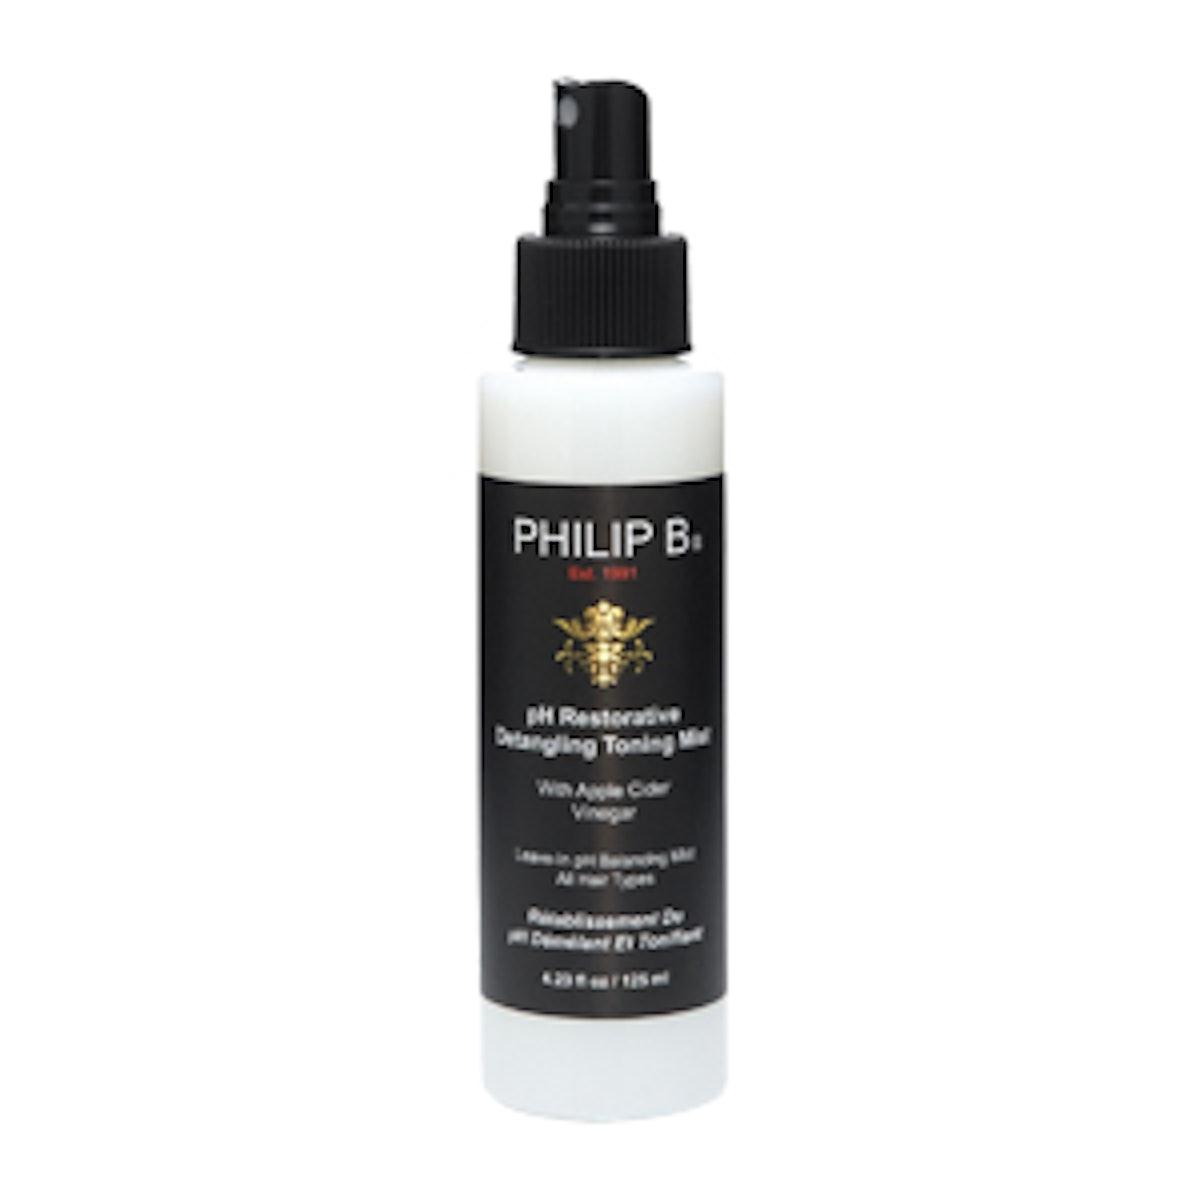 Philip B pH Restorative Detangling Toning Mist